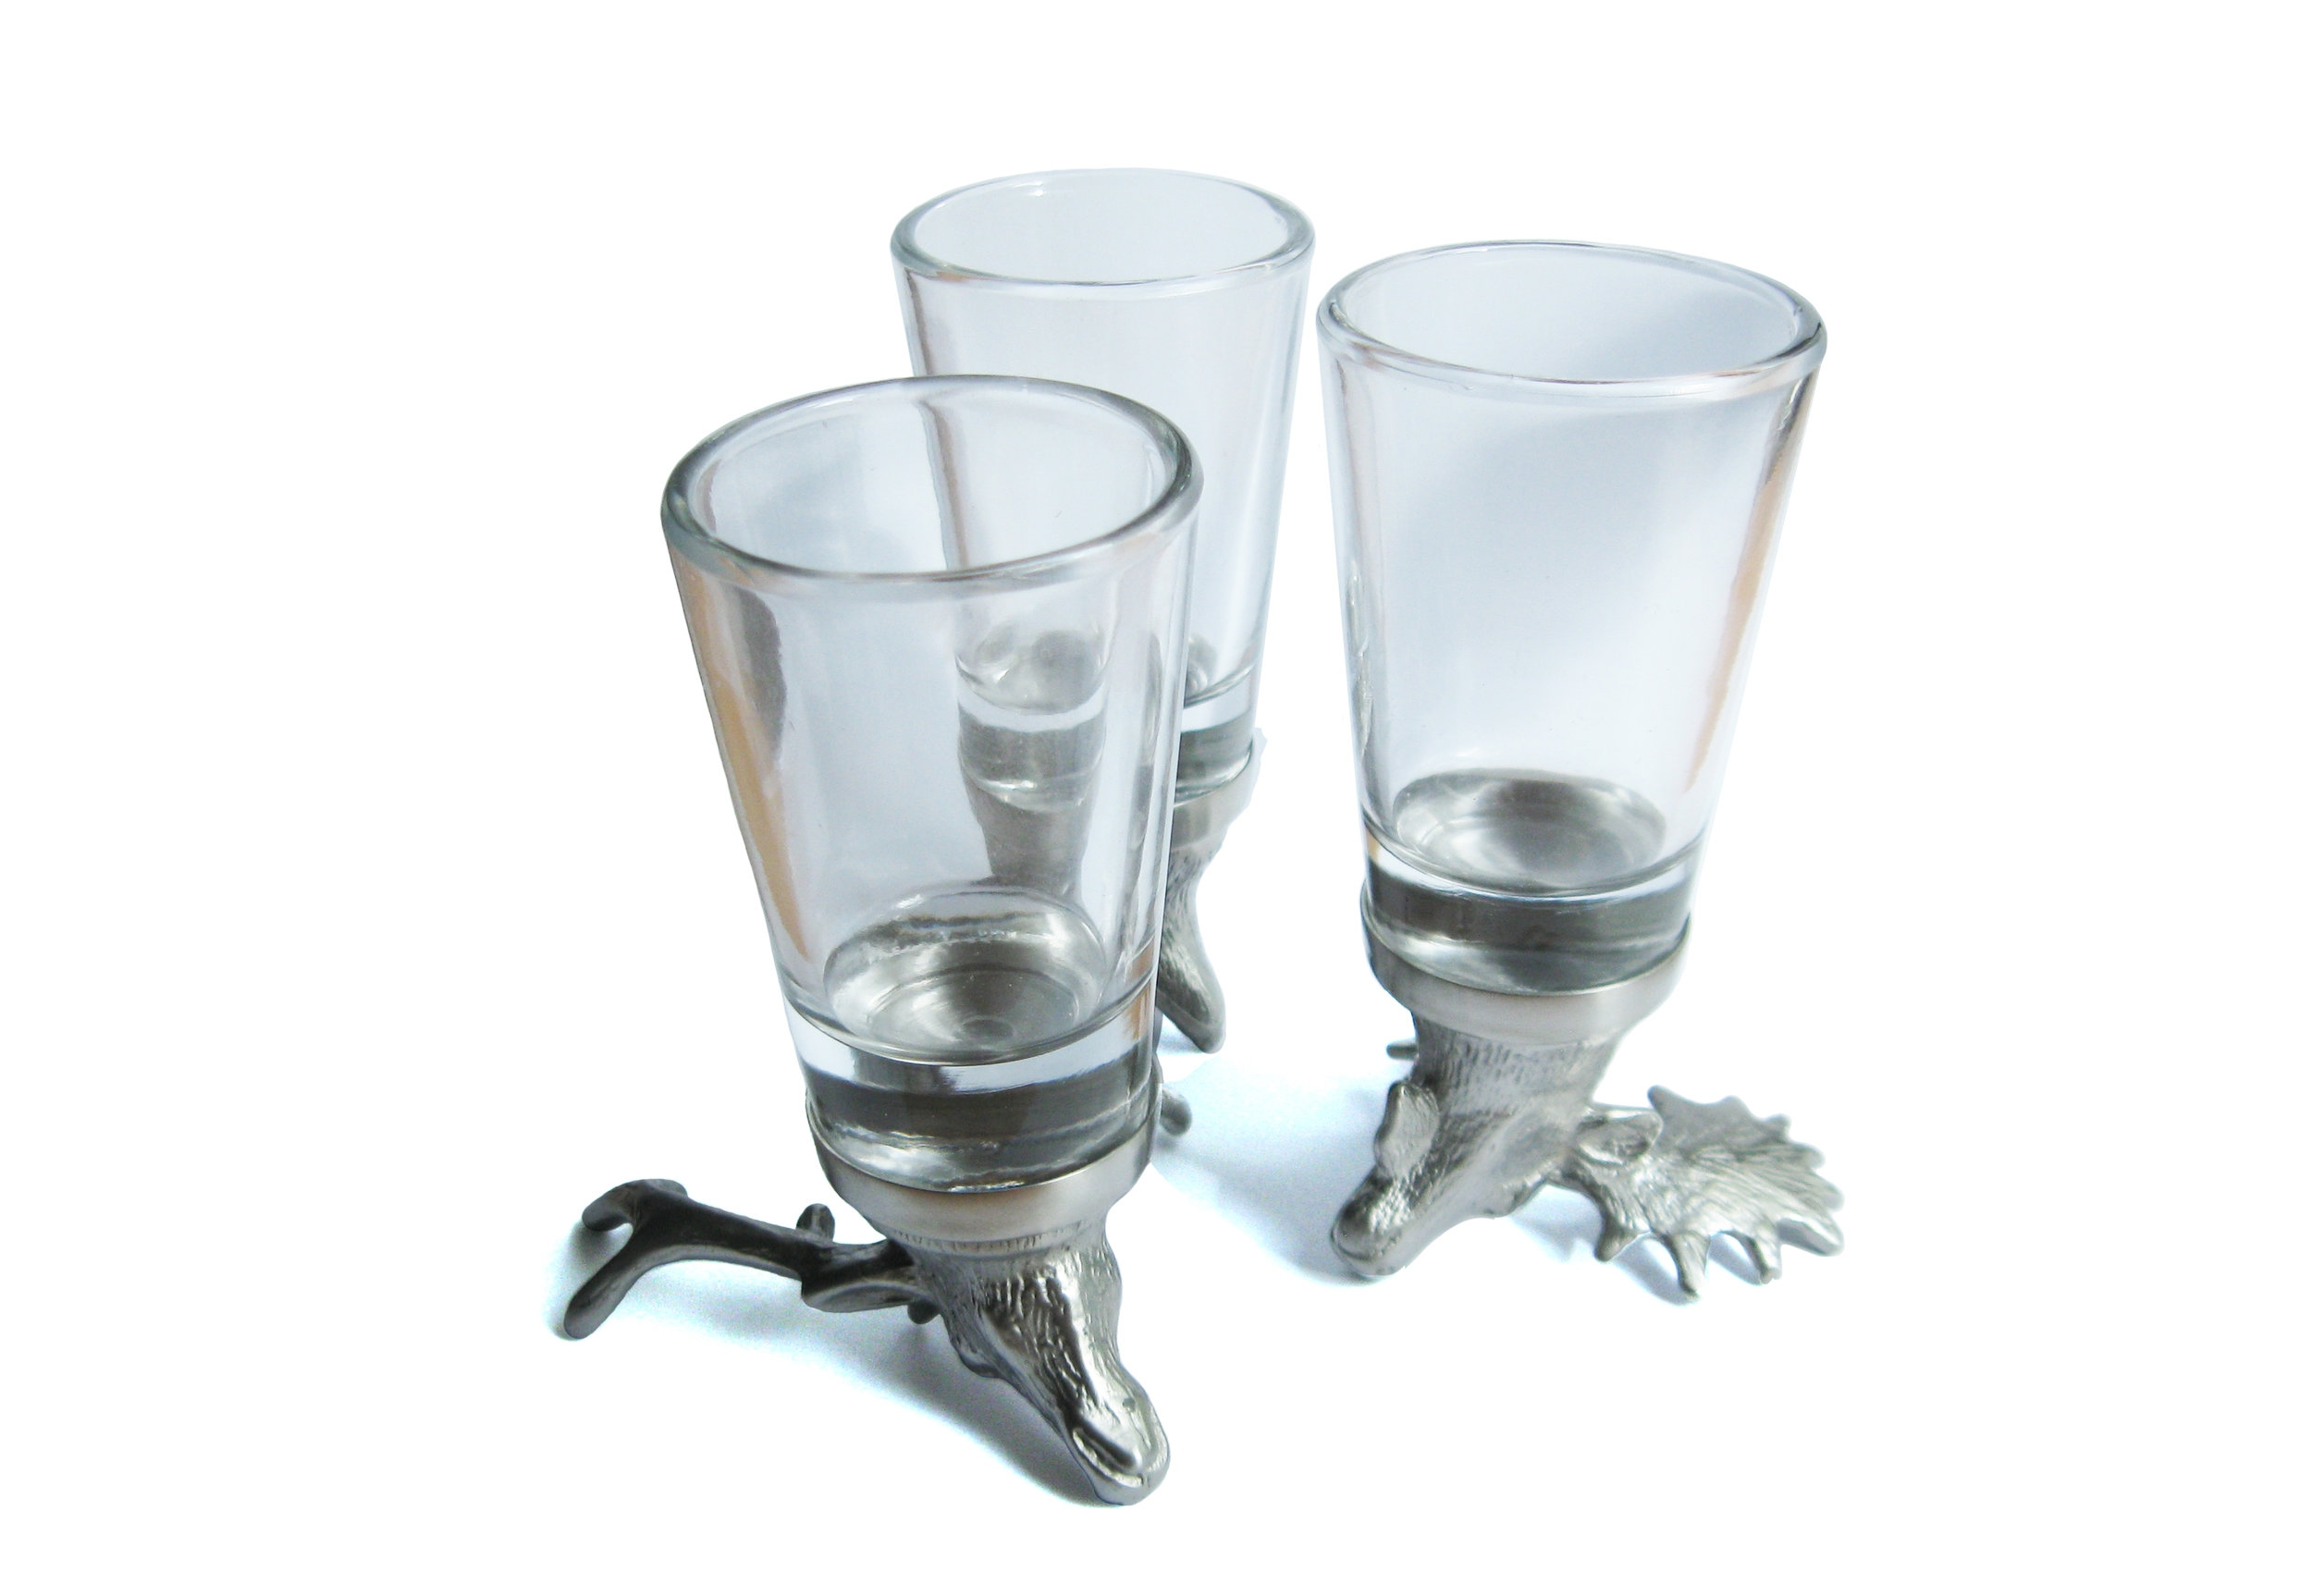 MENAGERIE Cordial/Dessert Wine/Shot Glasses, $29